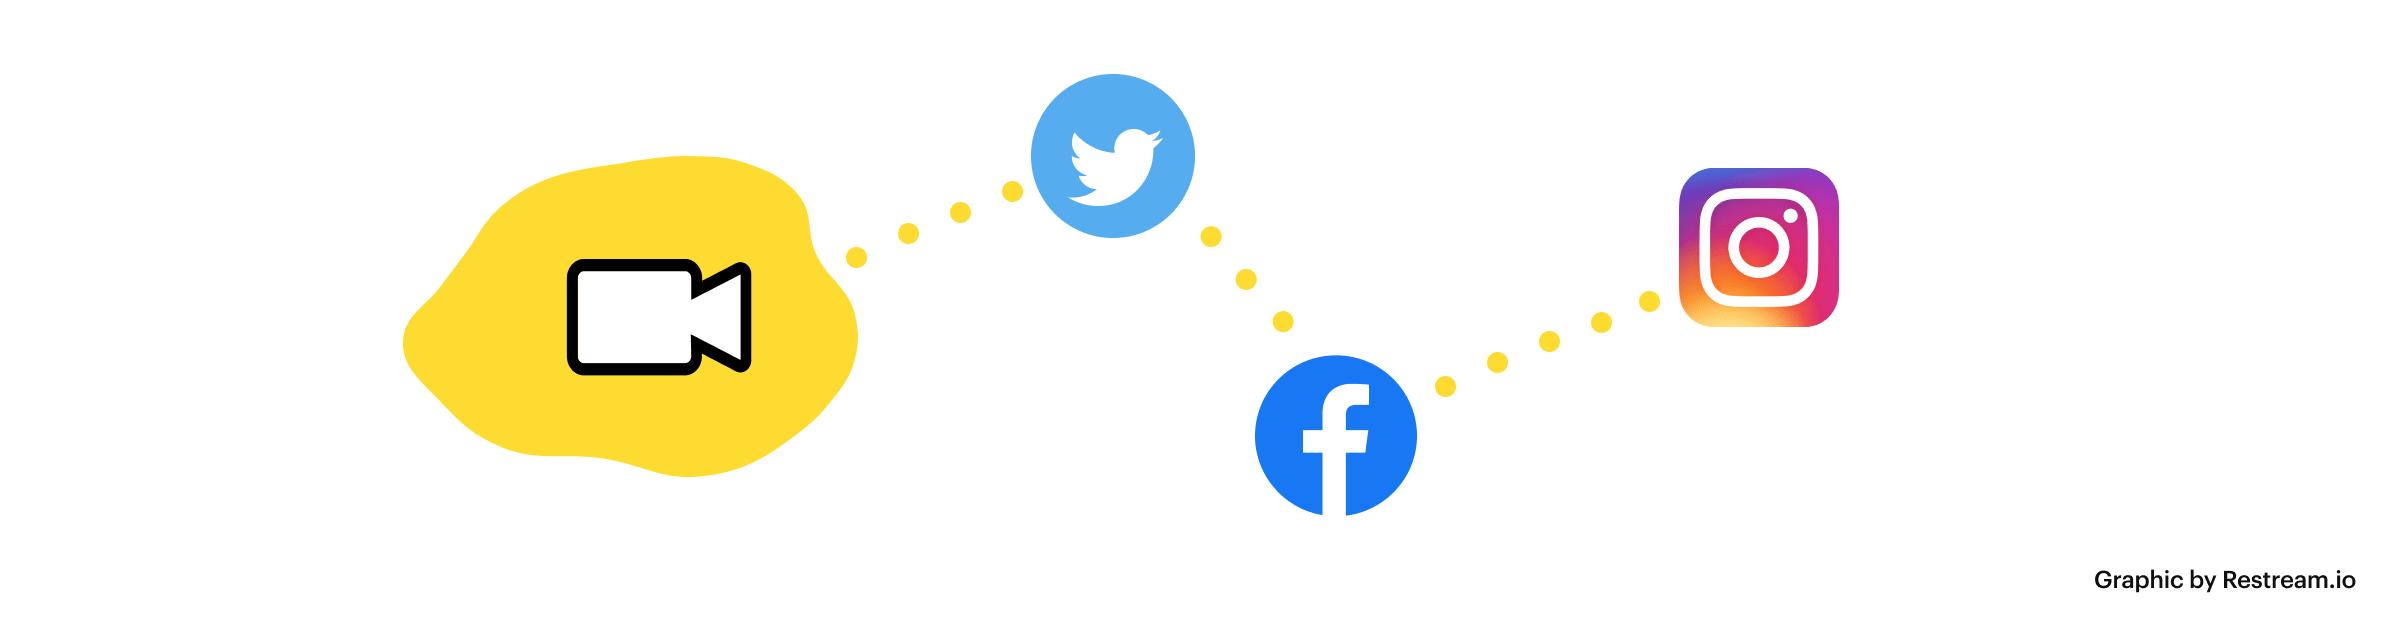 Videos on Twitter, Facebook, Instagram